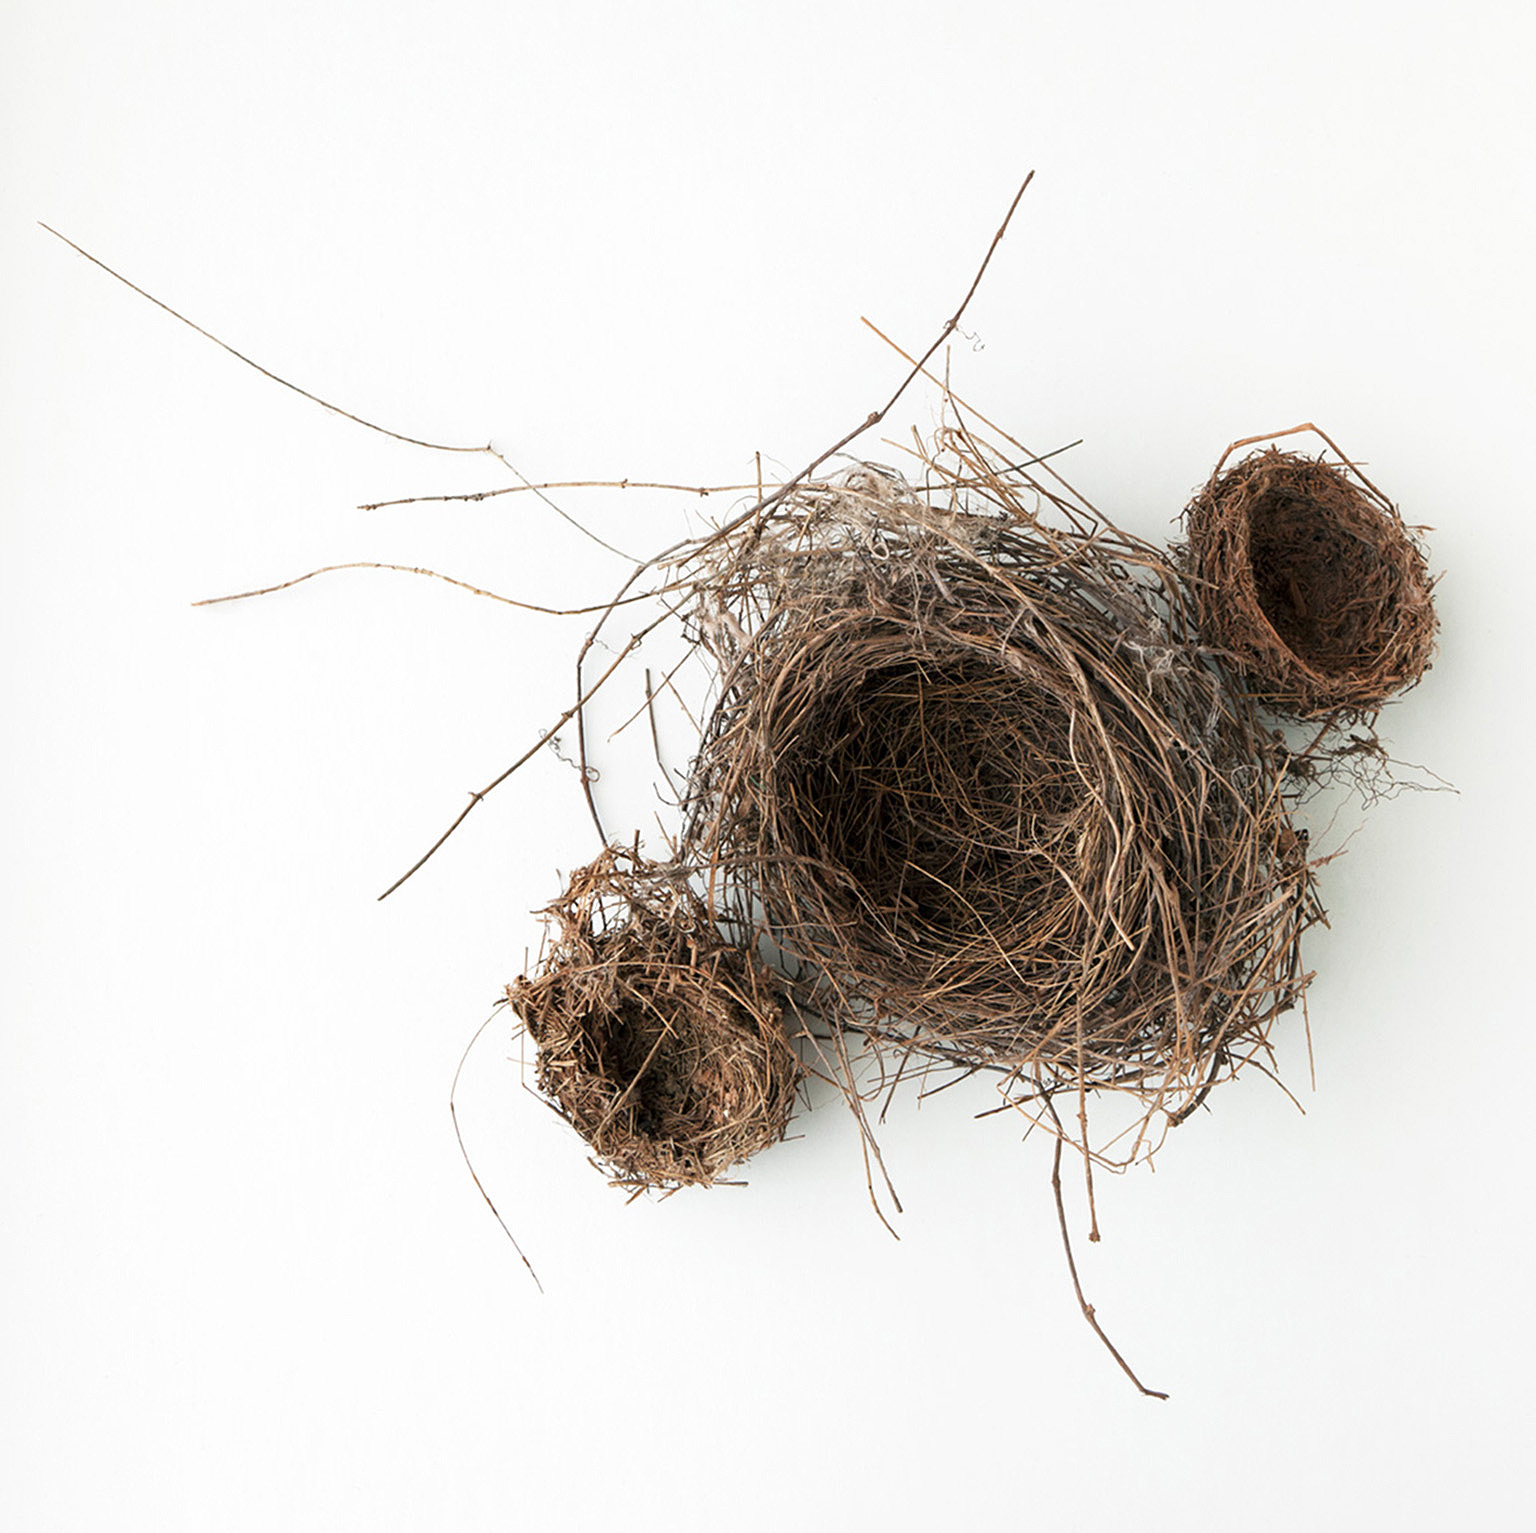 Nest #2461, 2017, archival pigment print, 10 x 10 in, $950; 16 x 16 in, $1,500